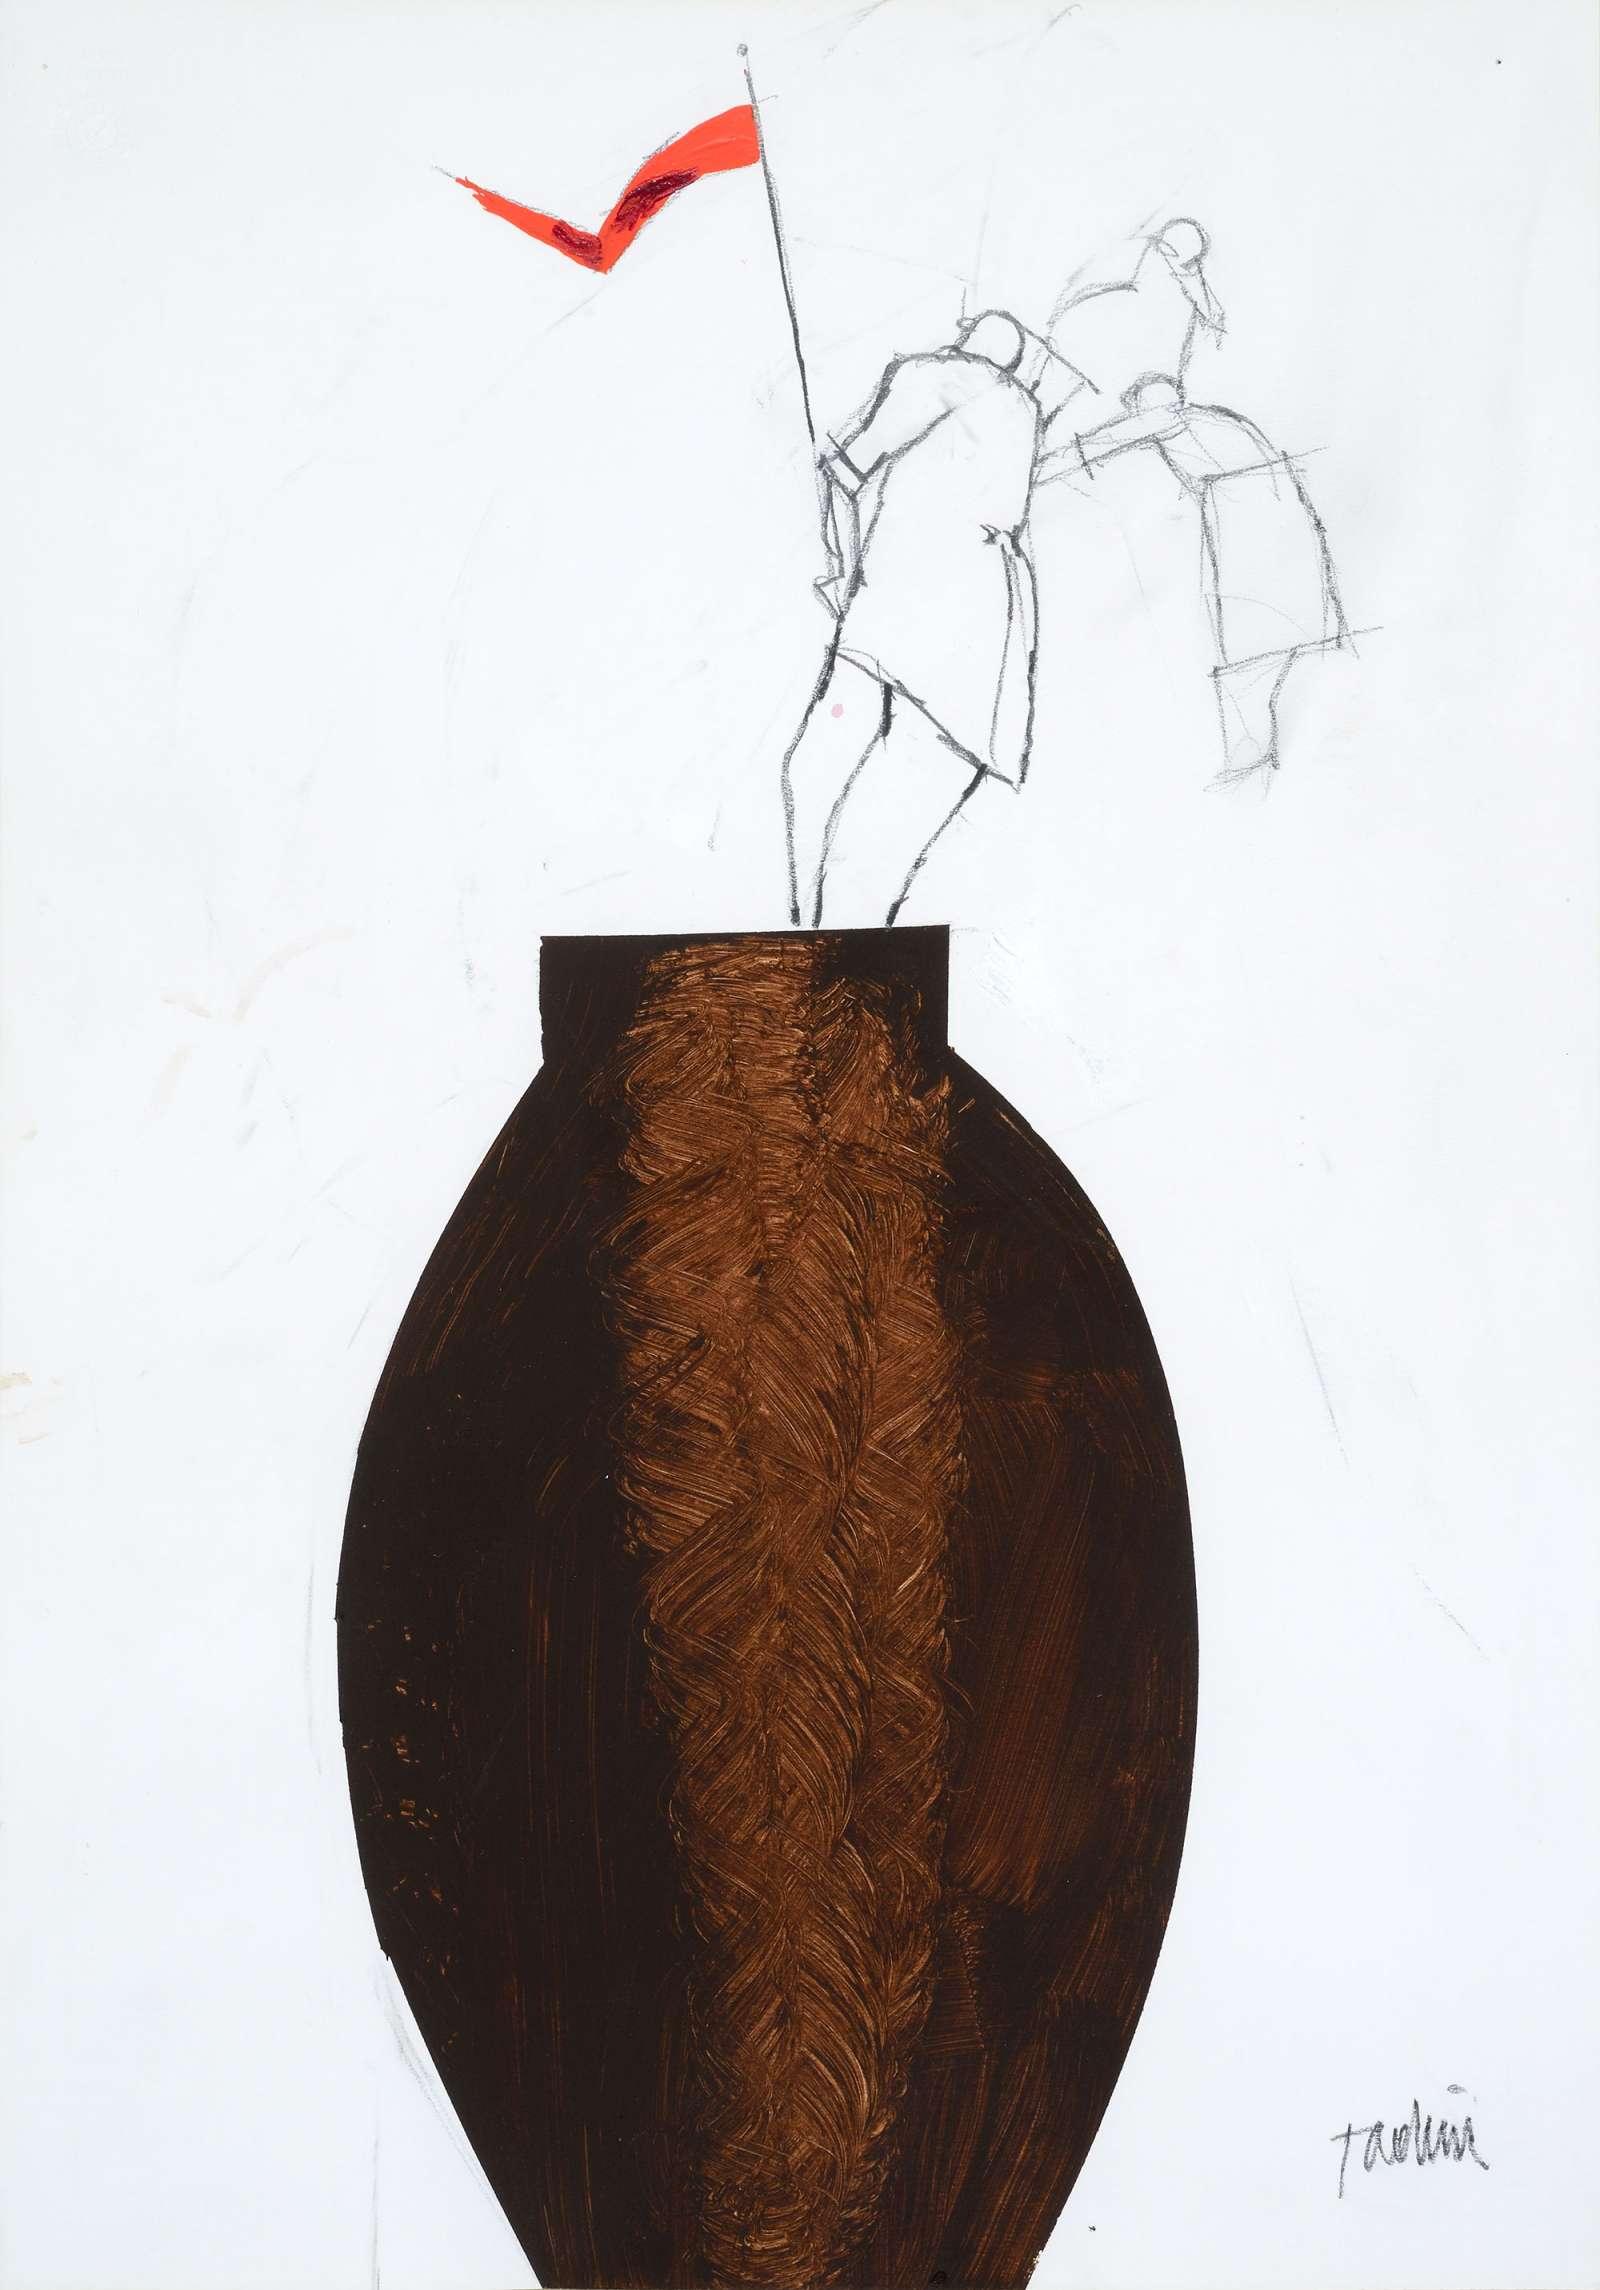 Emilio Tadini, Senza titolo, 1990